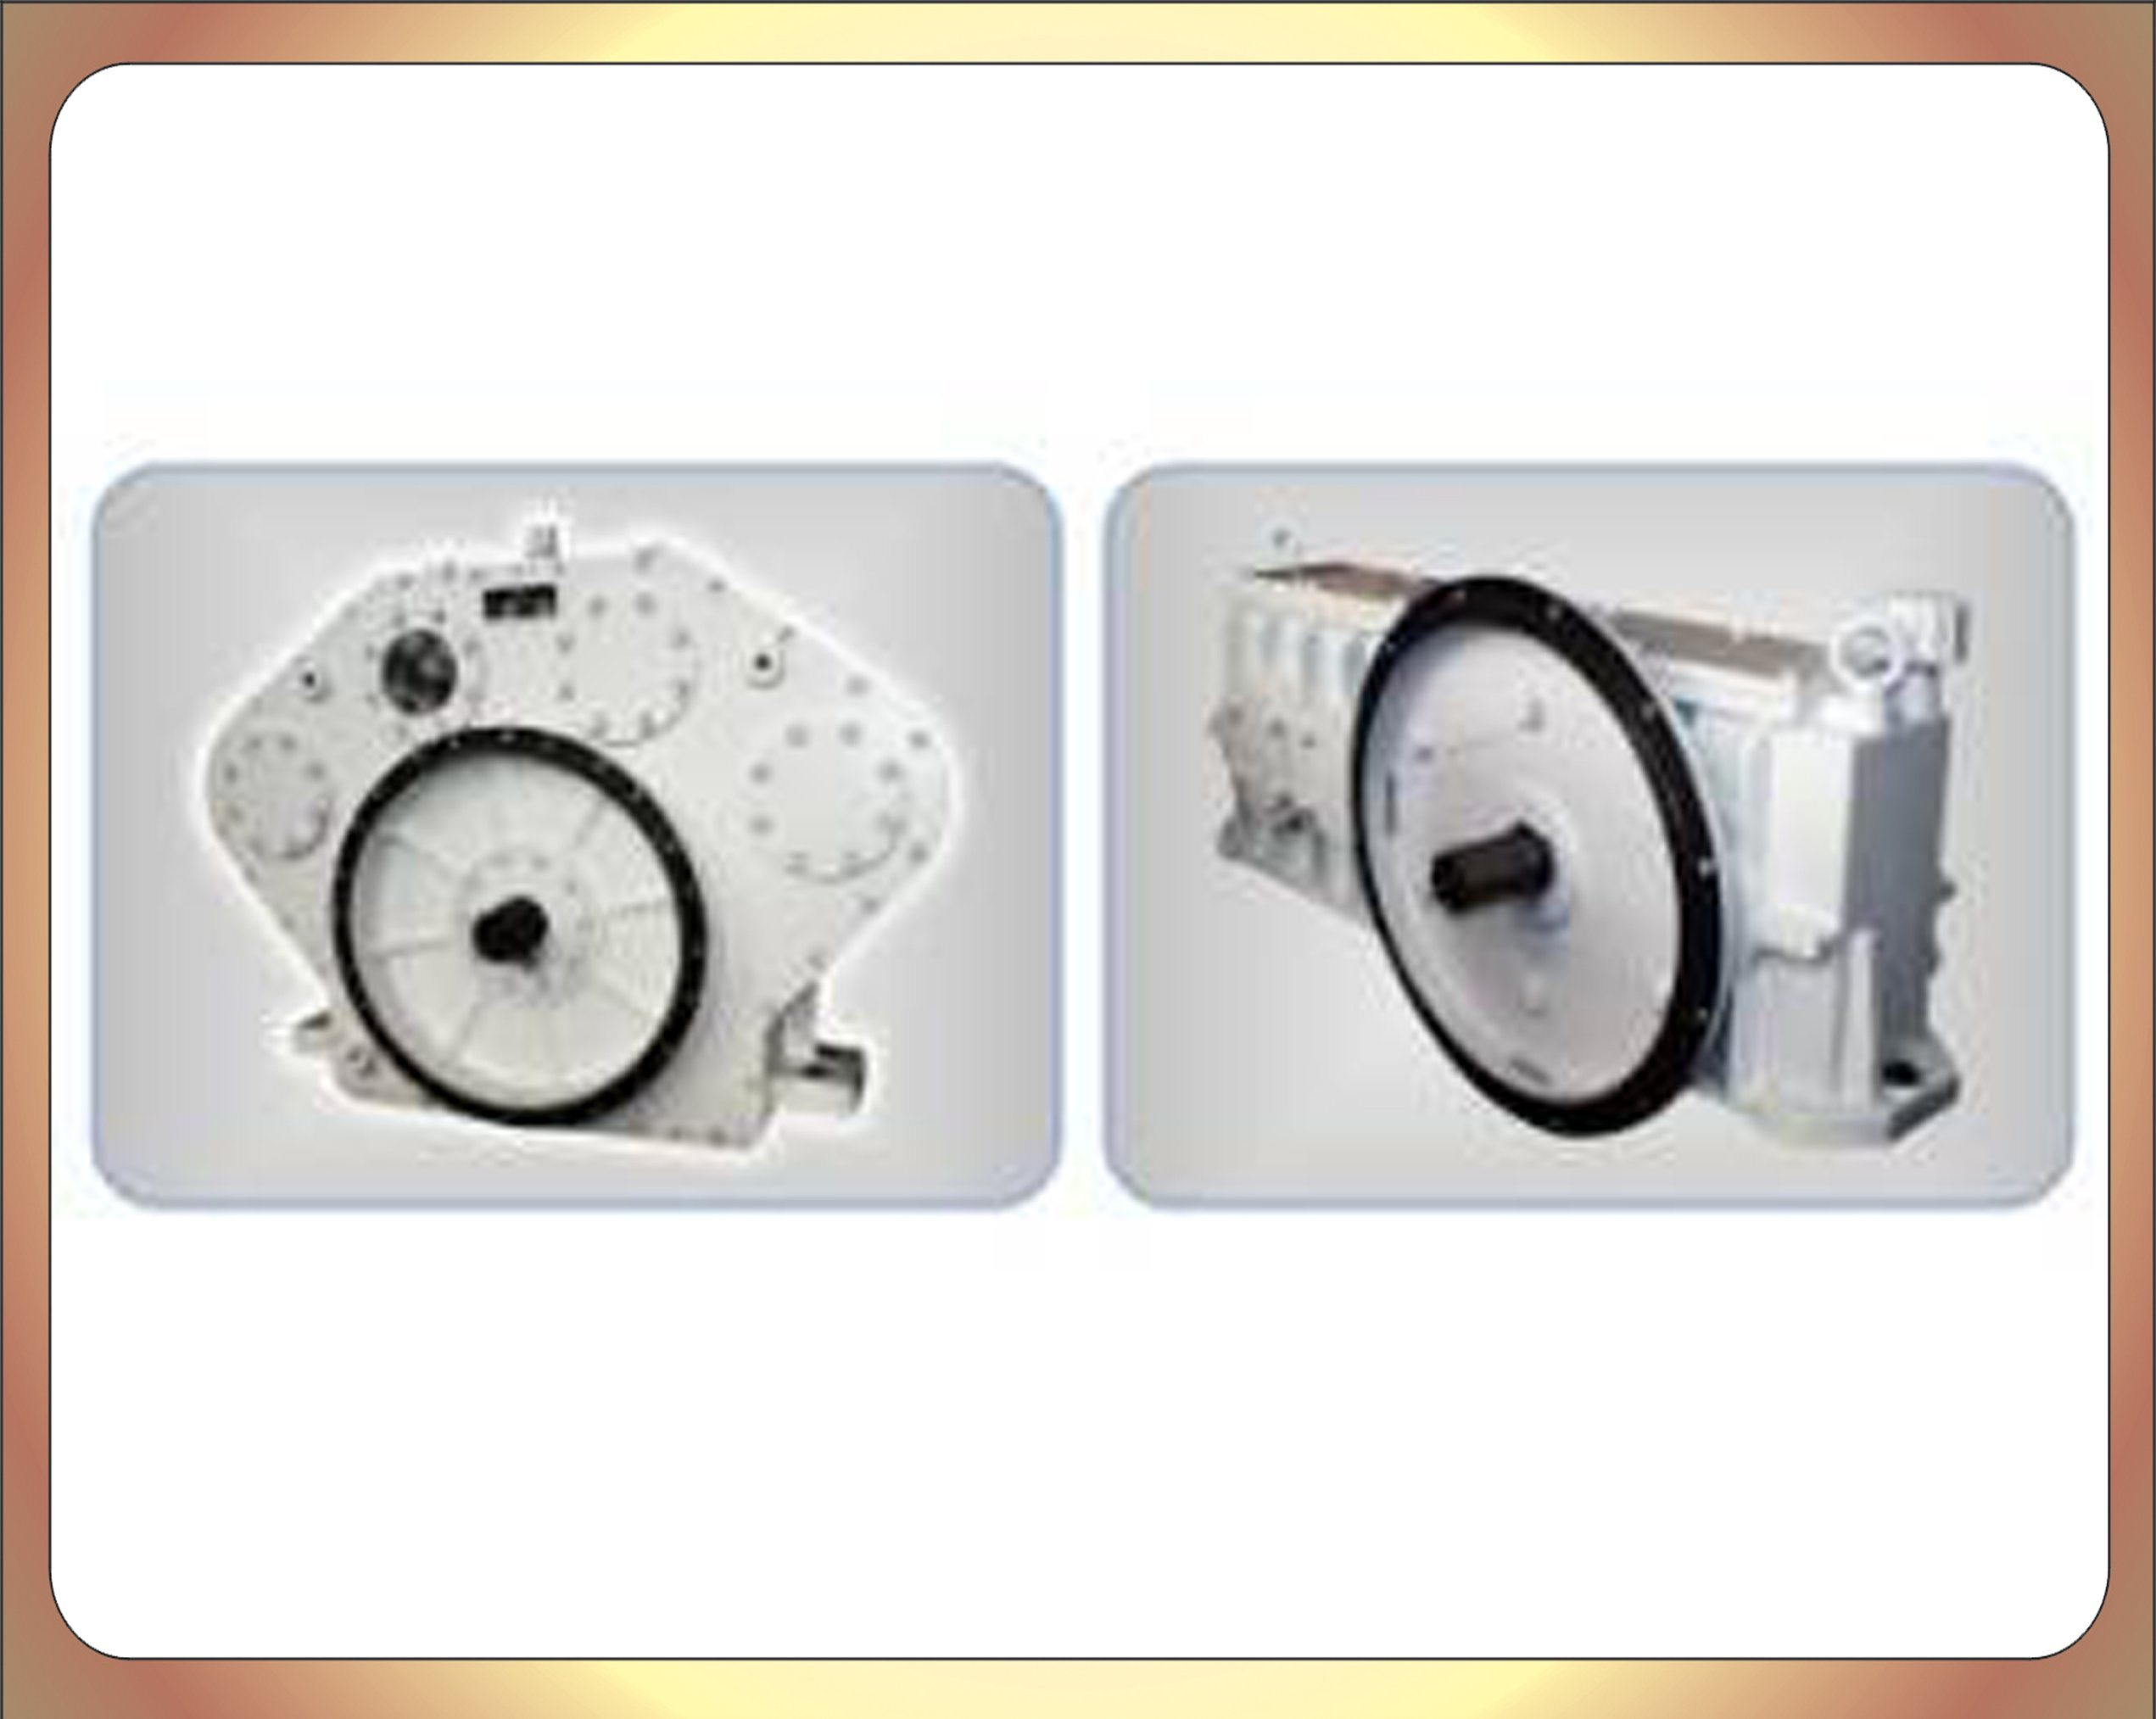 China Engineering Machinery Products Gear Box - China Engineering